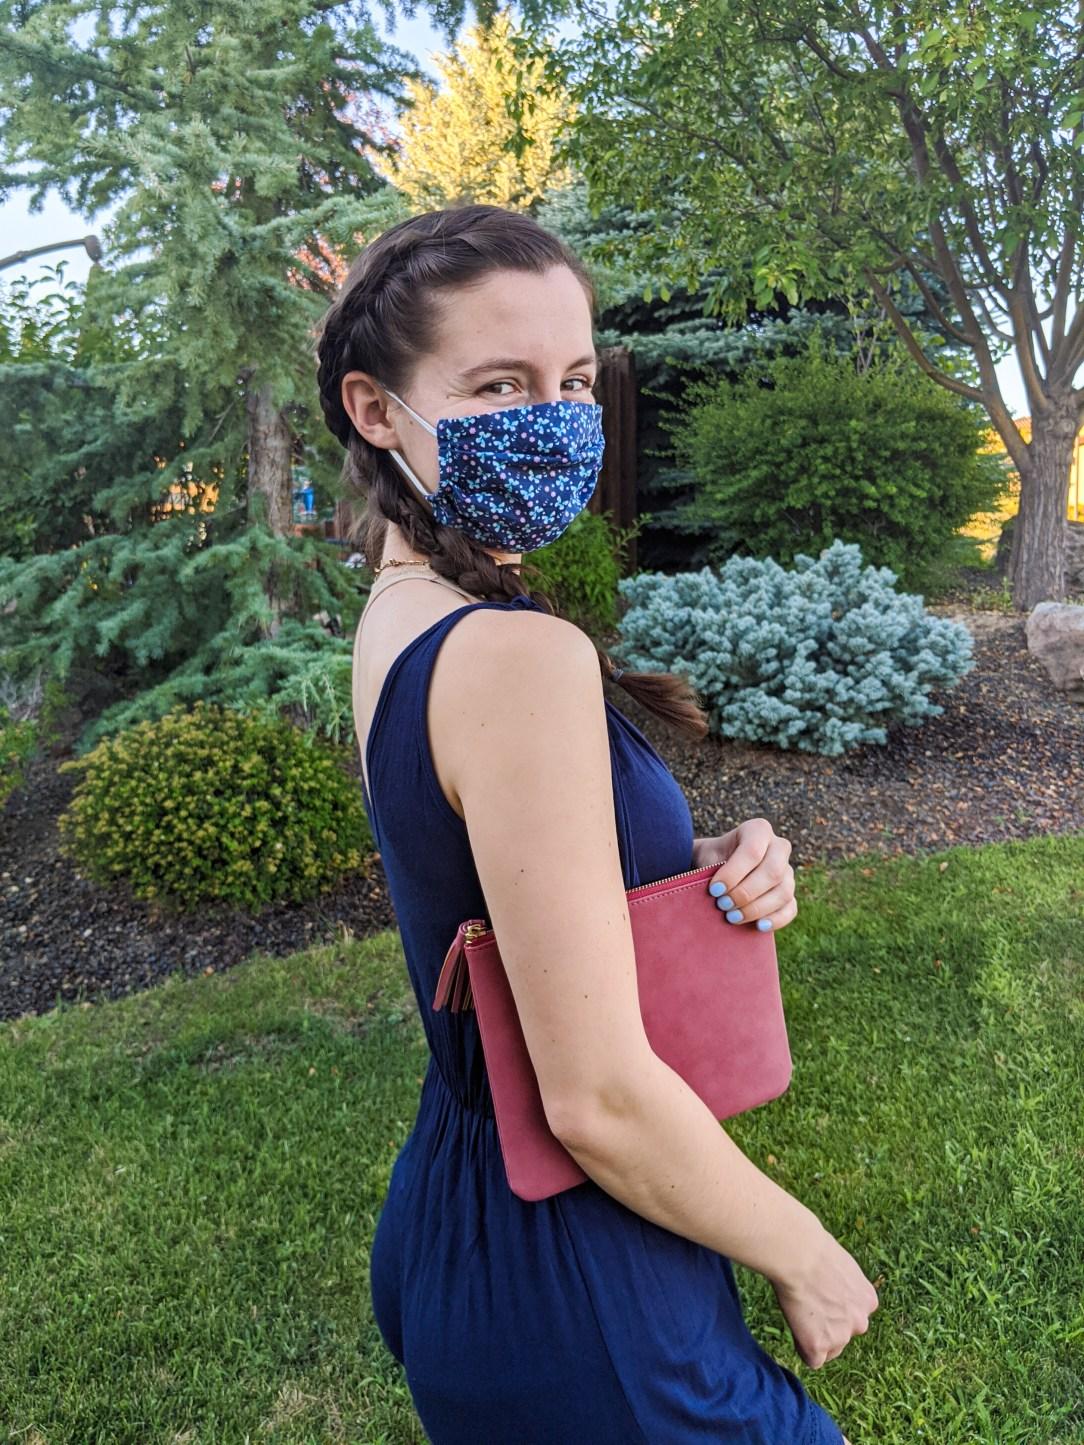 floral-face-mask-red-purse-Francesca's-mask-fashion